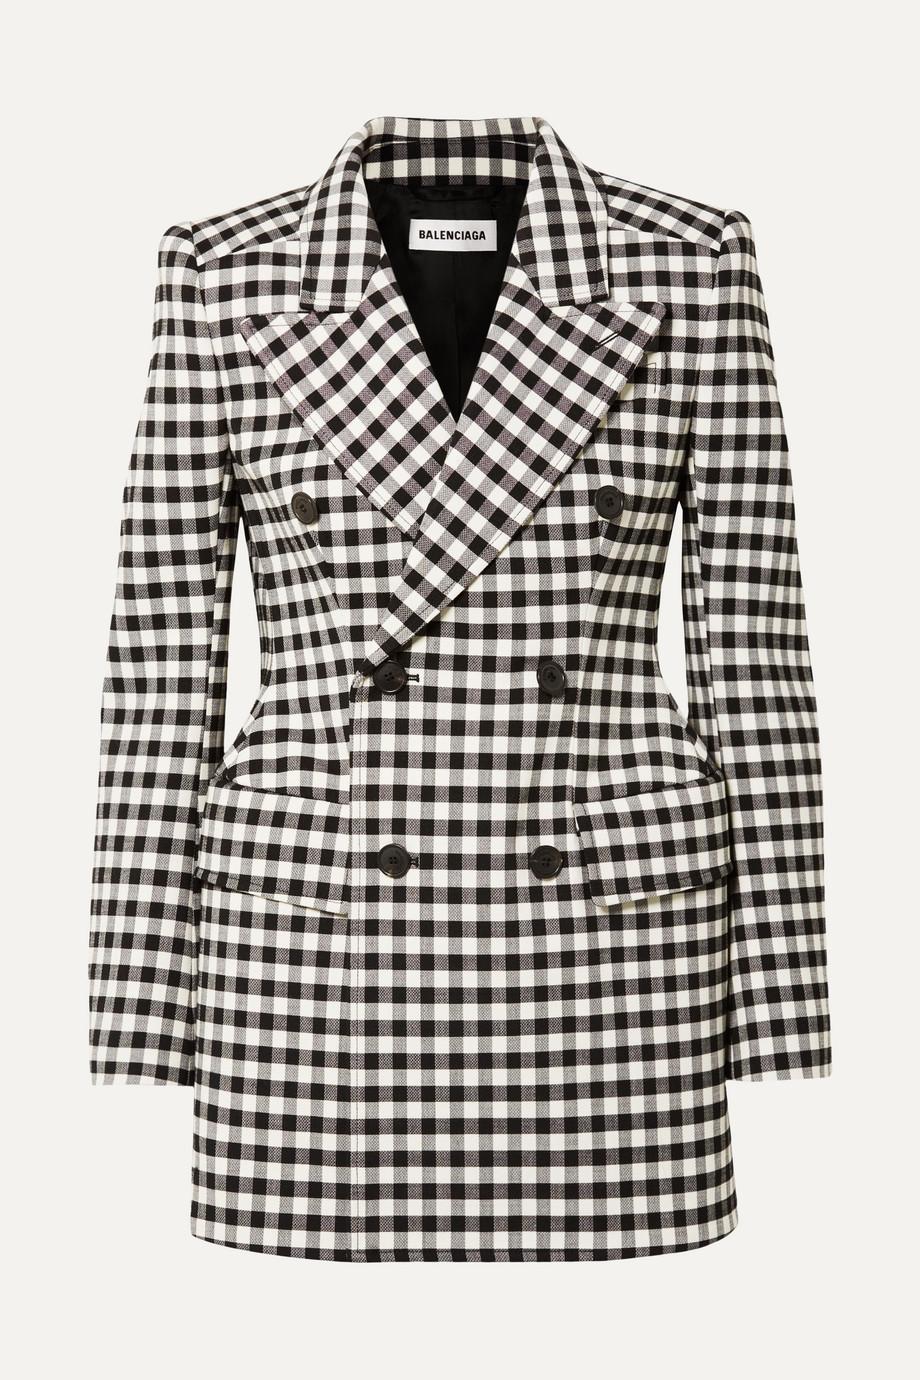 Exact Product: Kylie Jenner Grey Blazer Photoshoot 2019, Brand: Balenciaga, Available on: net-a-porter.com, Price: $2990